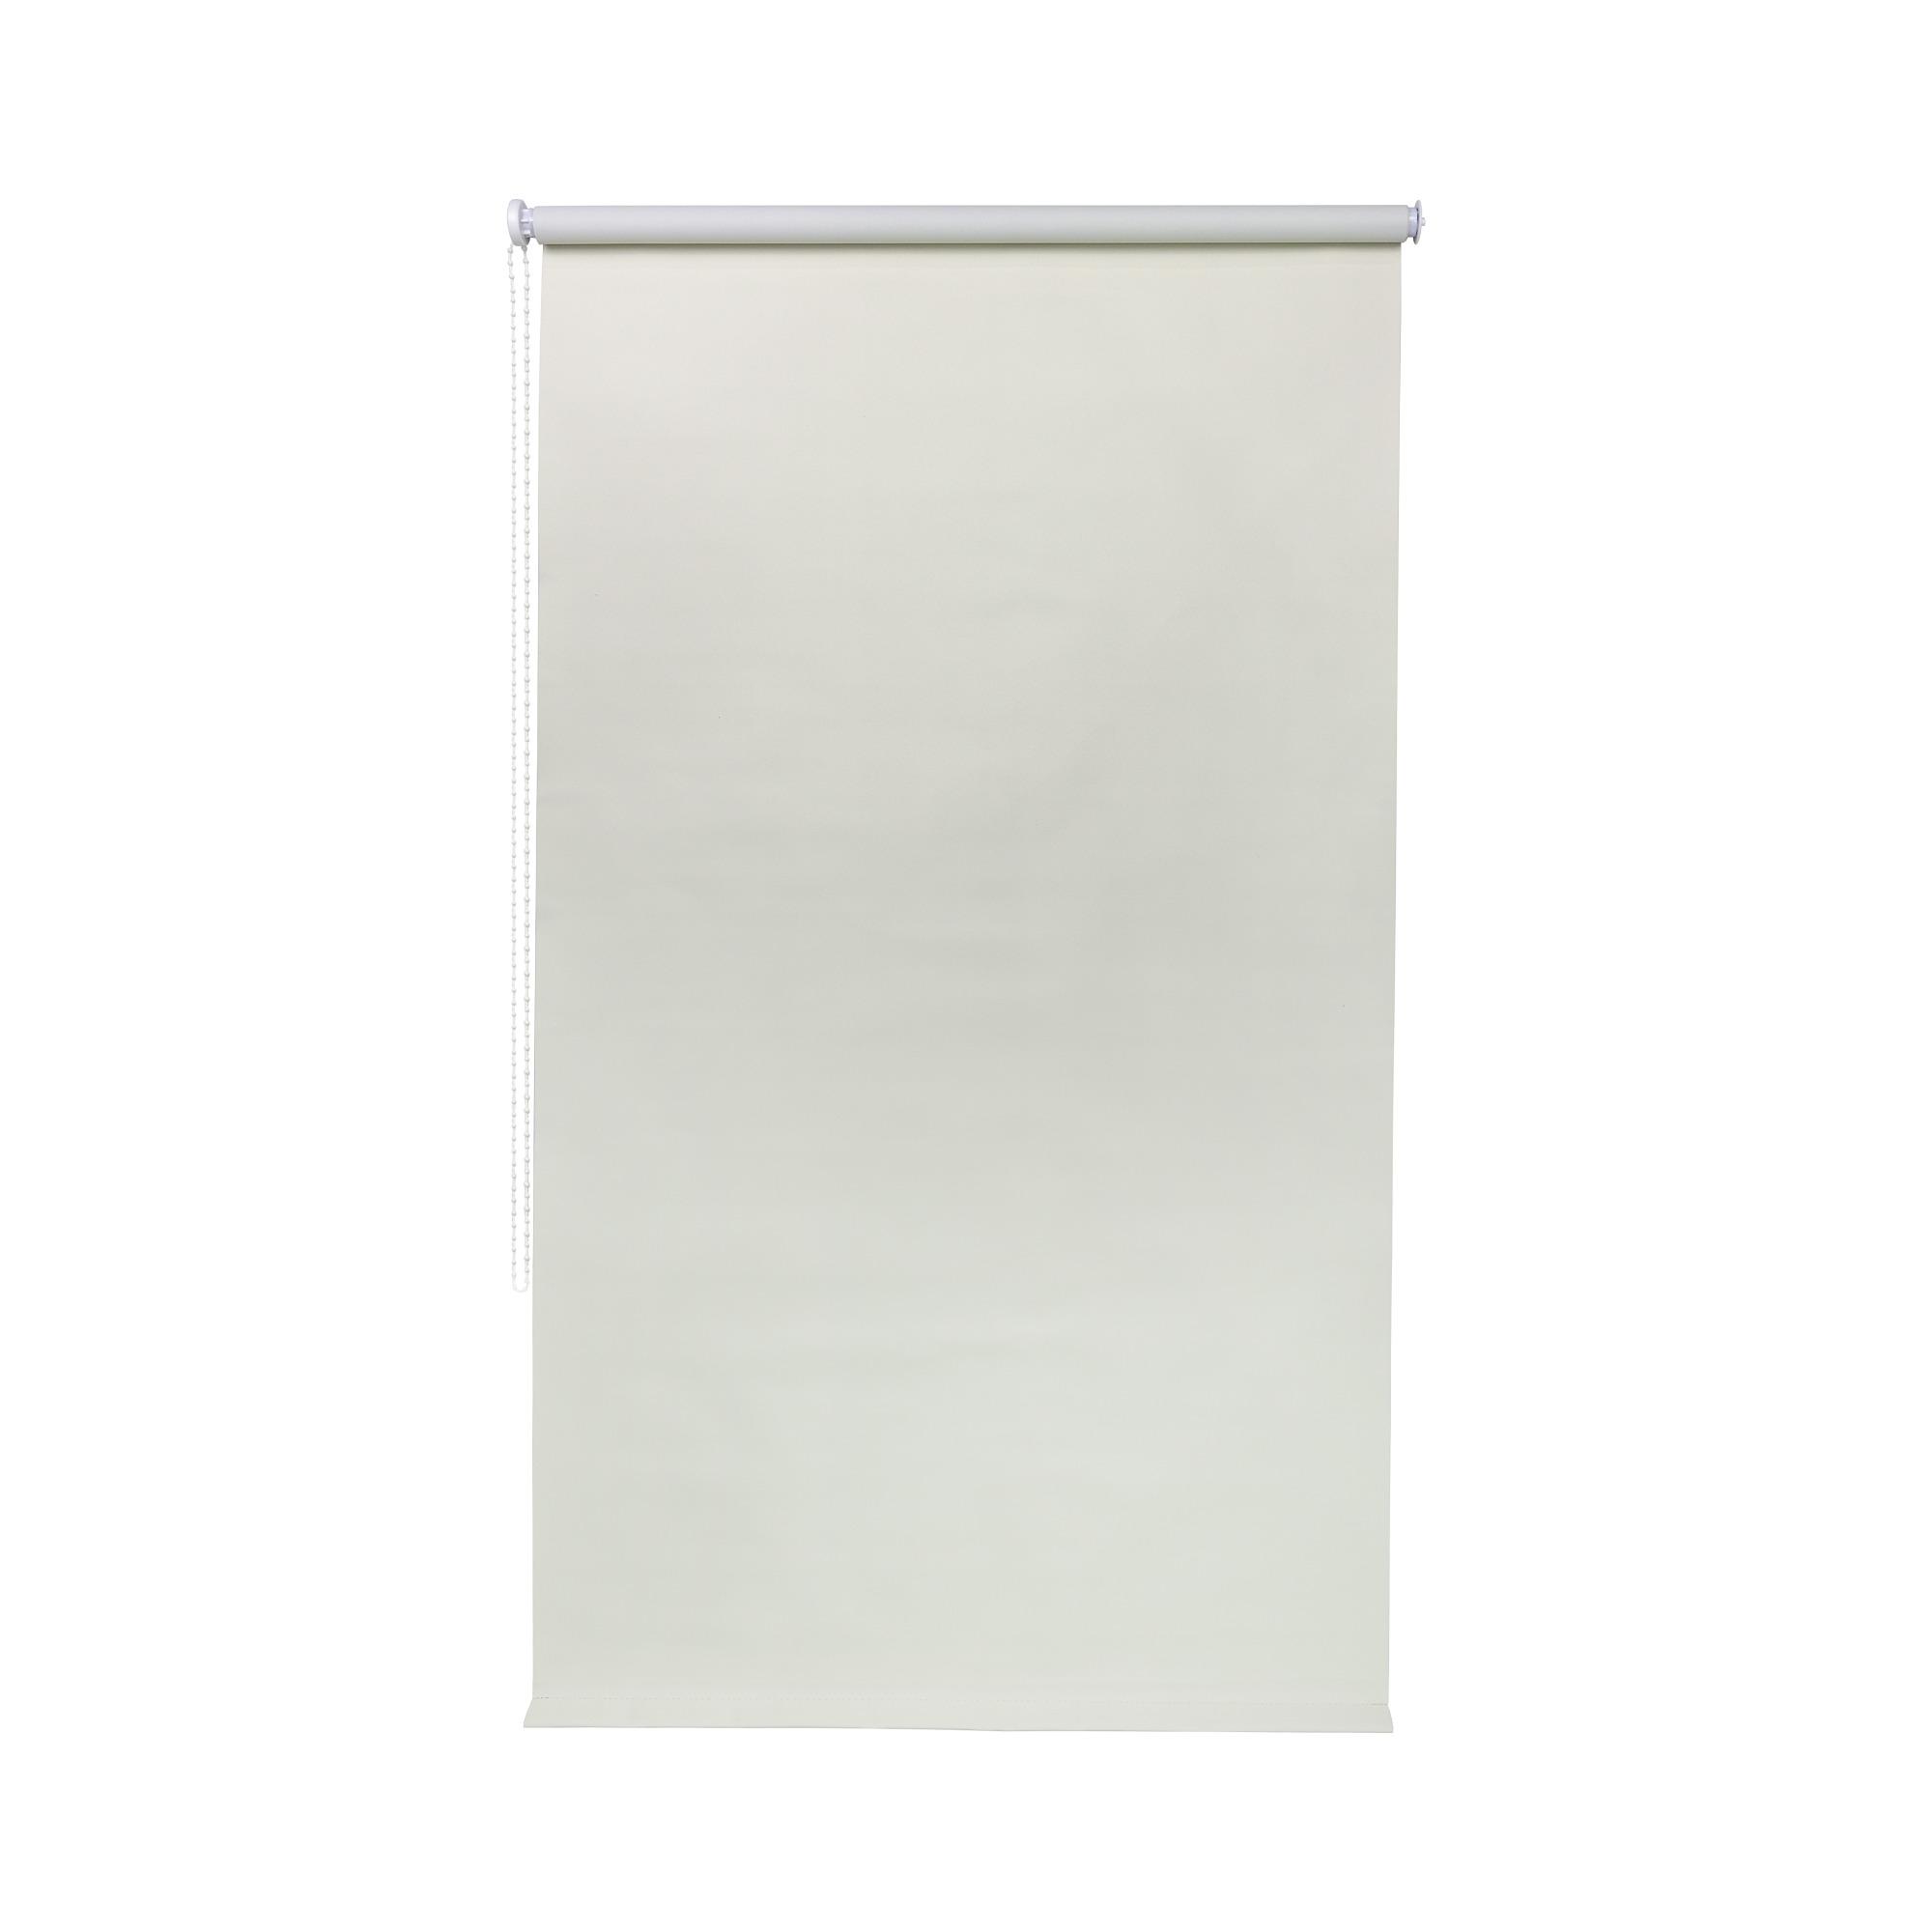 imagem de persiana rolo bege 080x170 - jolie persianasjpg